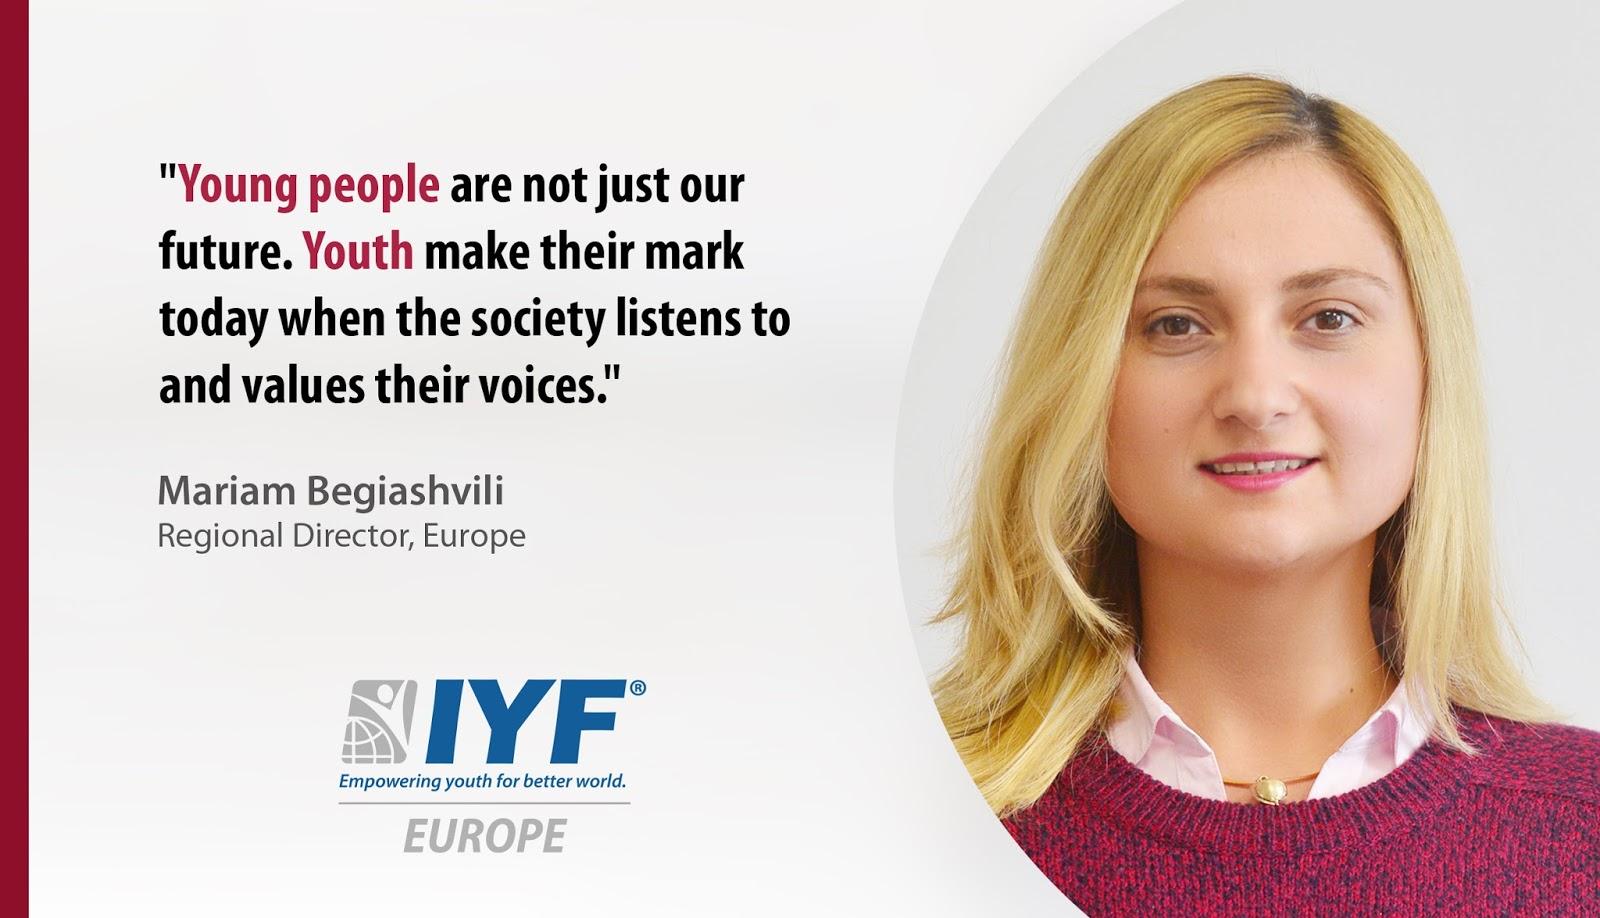 Mariam Begiashvili, IYF Regional Director, Europe